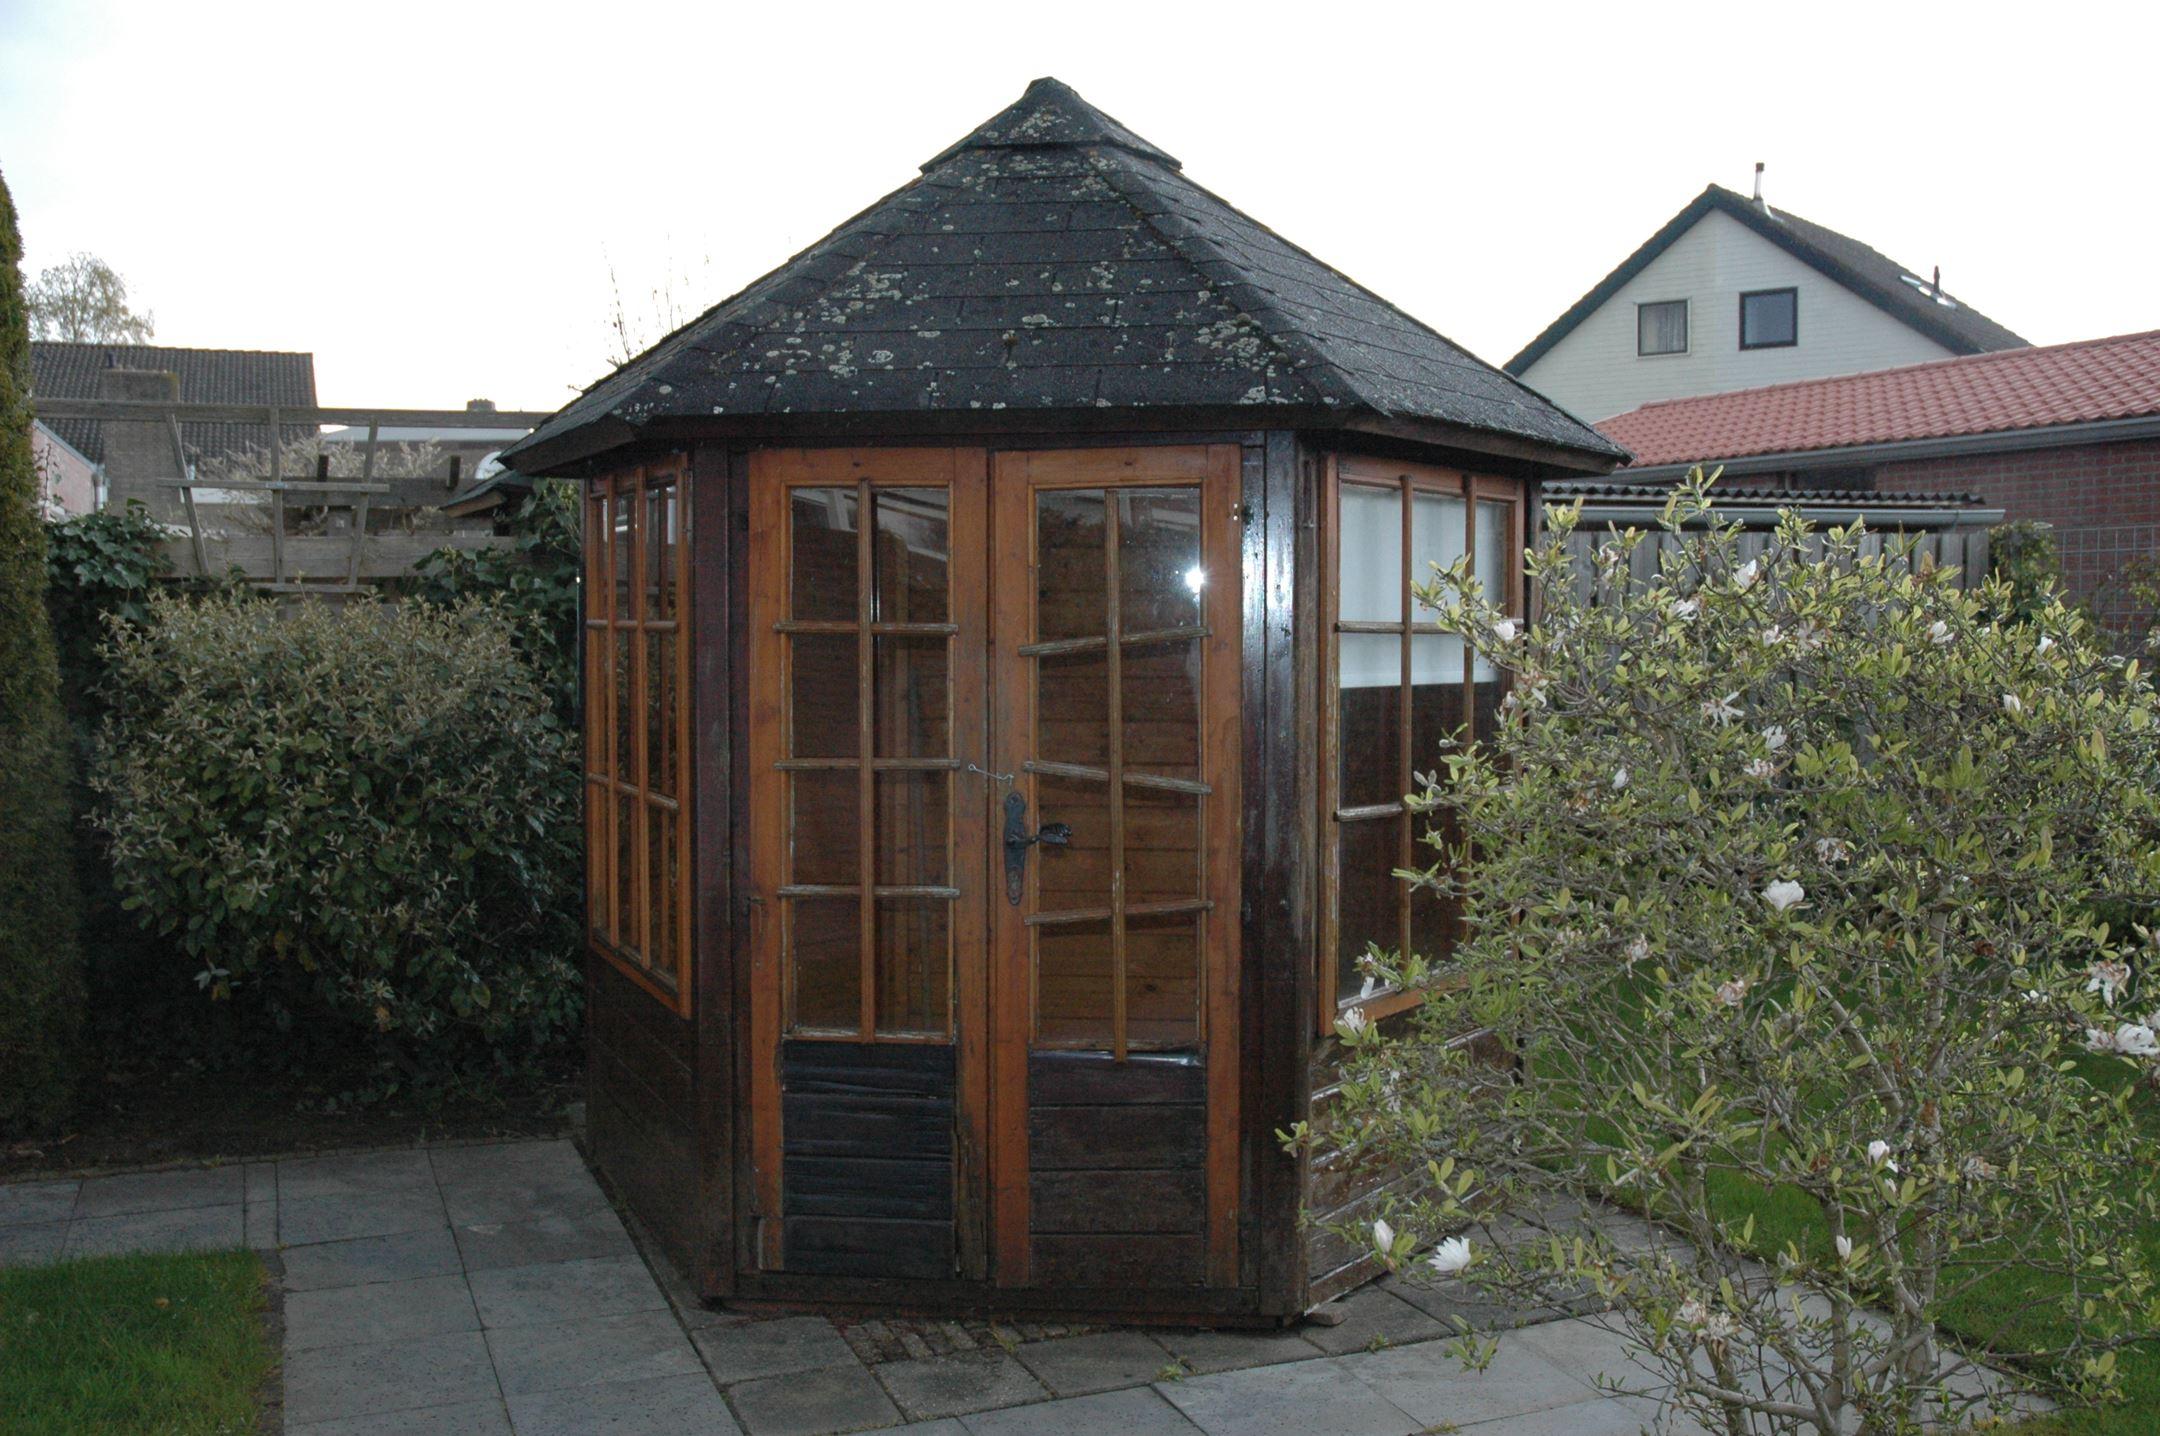 Huis te koop Washingtonstraat 18 3255 VJ Oude Tonge [funda]